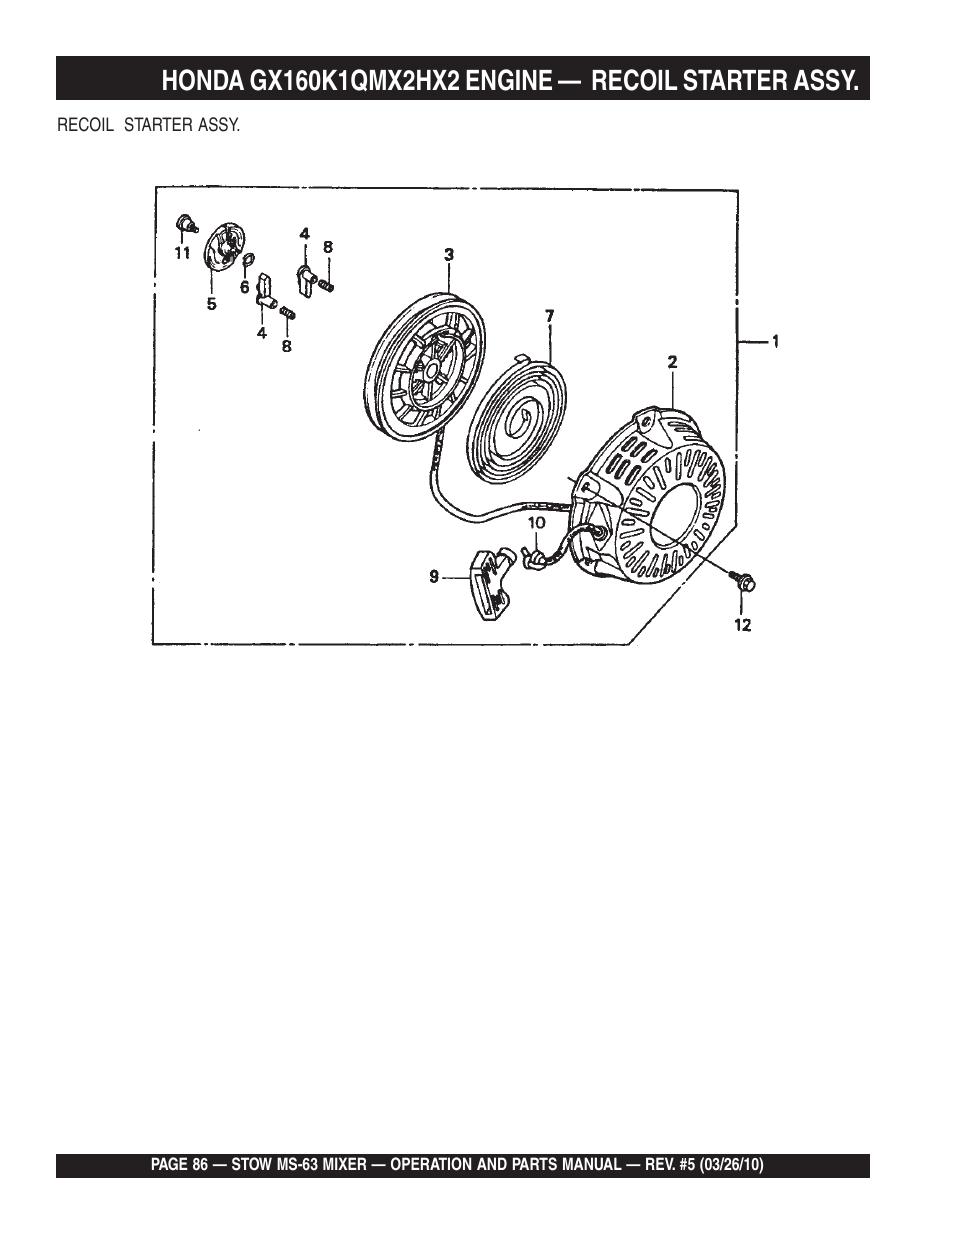 Stow Mortar Mixer Parts Manual - User Manual Guide •